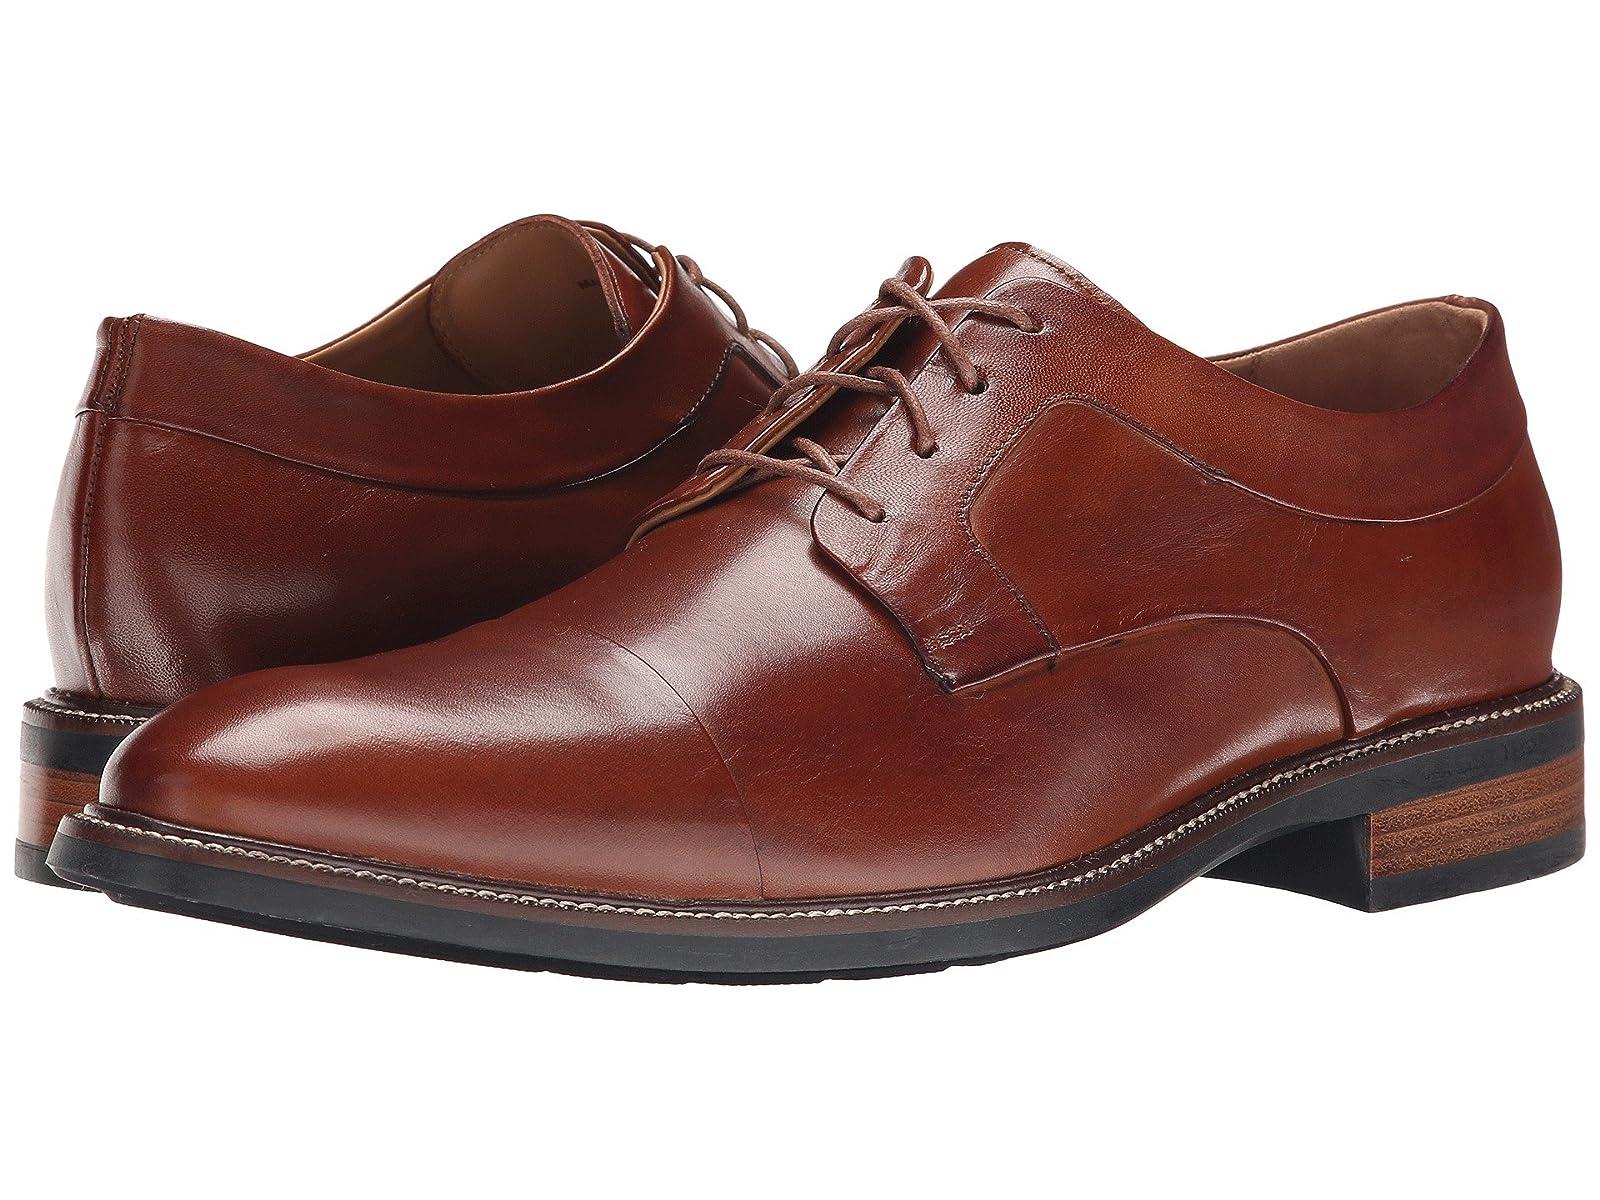 Cole Haan Warren Cap OxAtmospheric grades have affordable shoes